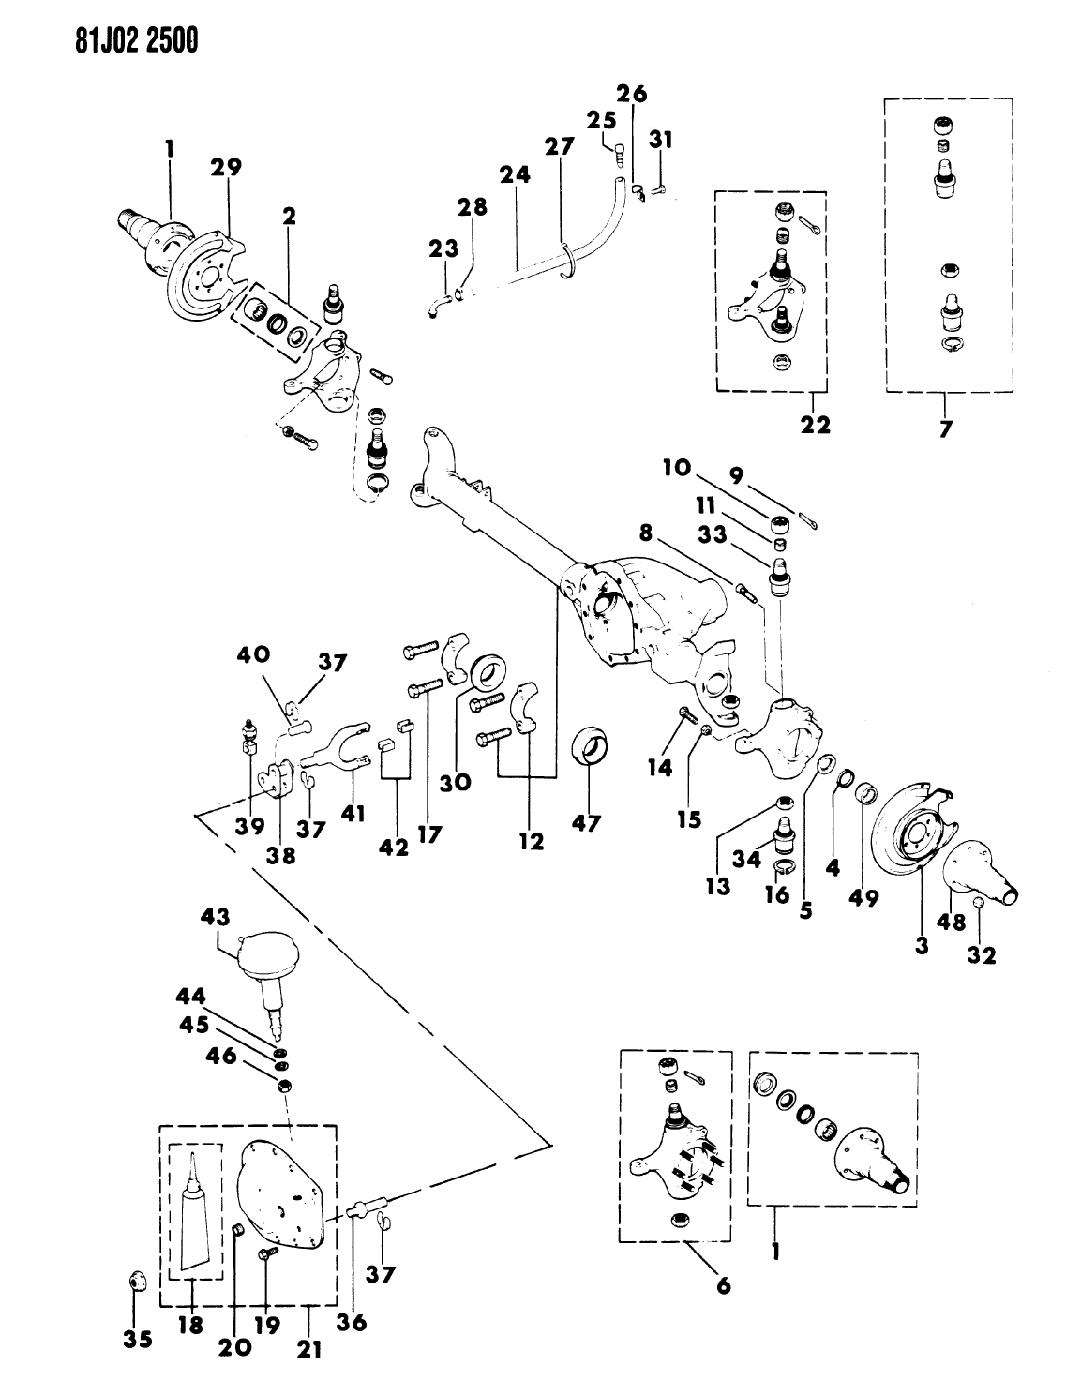 1984 jeep grand wagoneer engine diagram  jeep  auto wiring